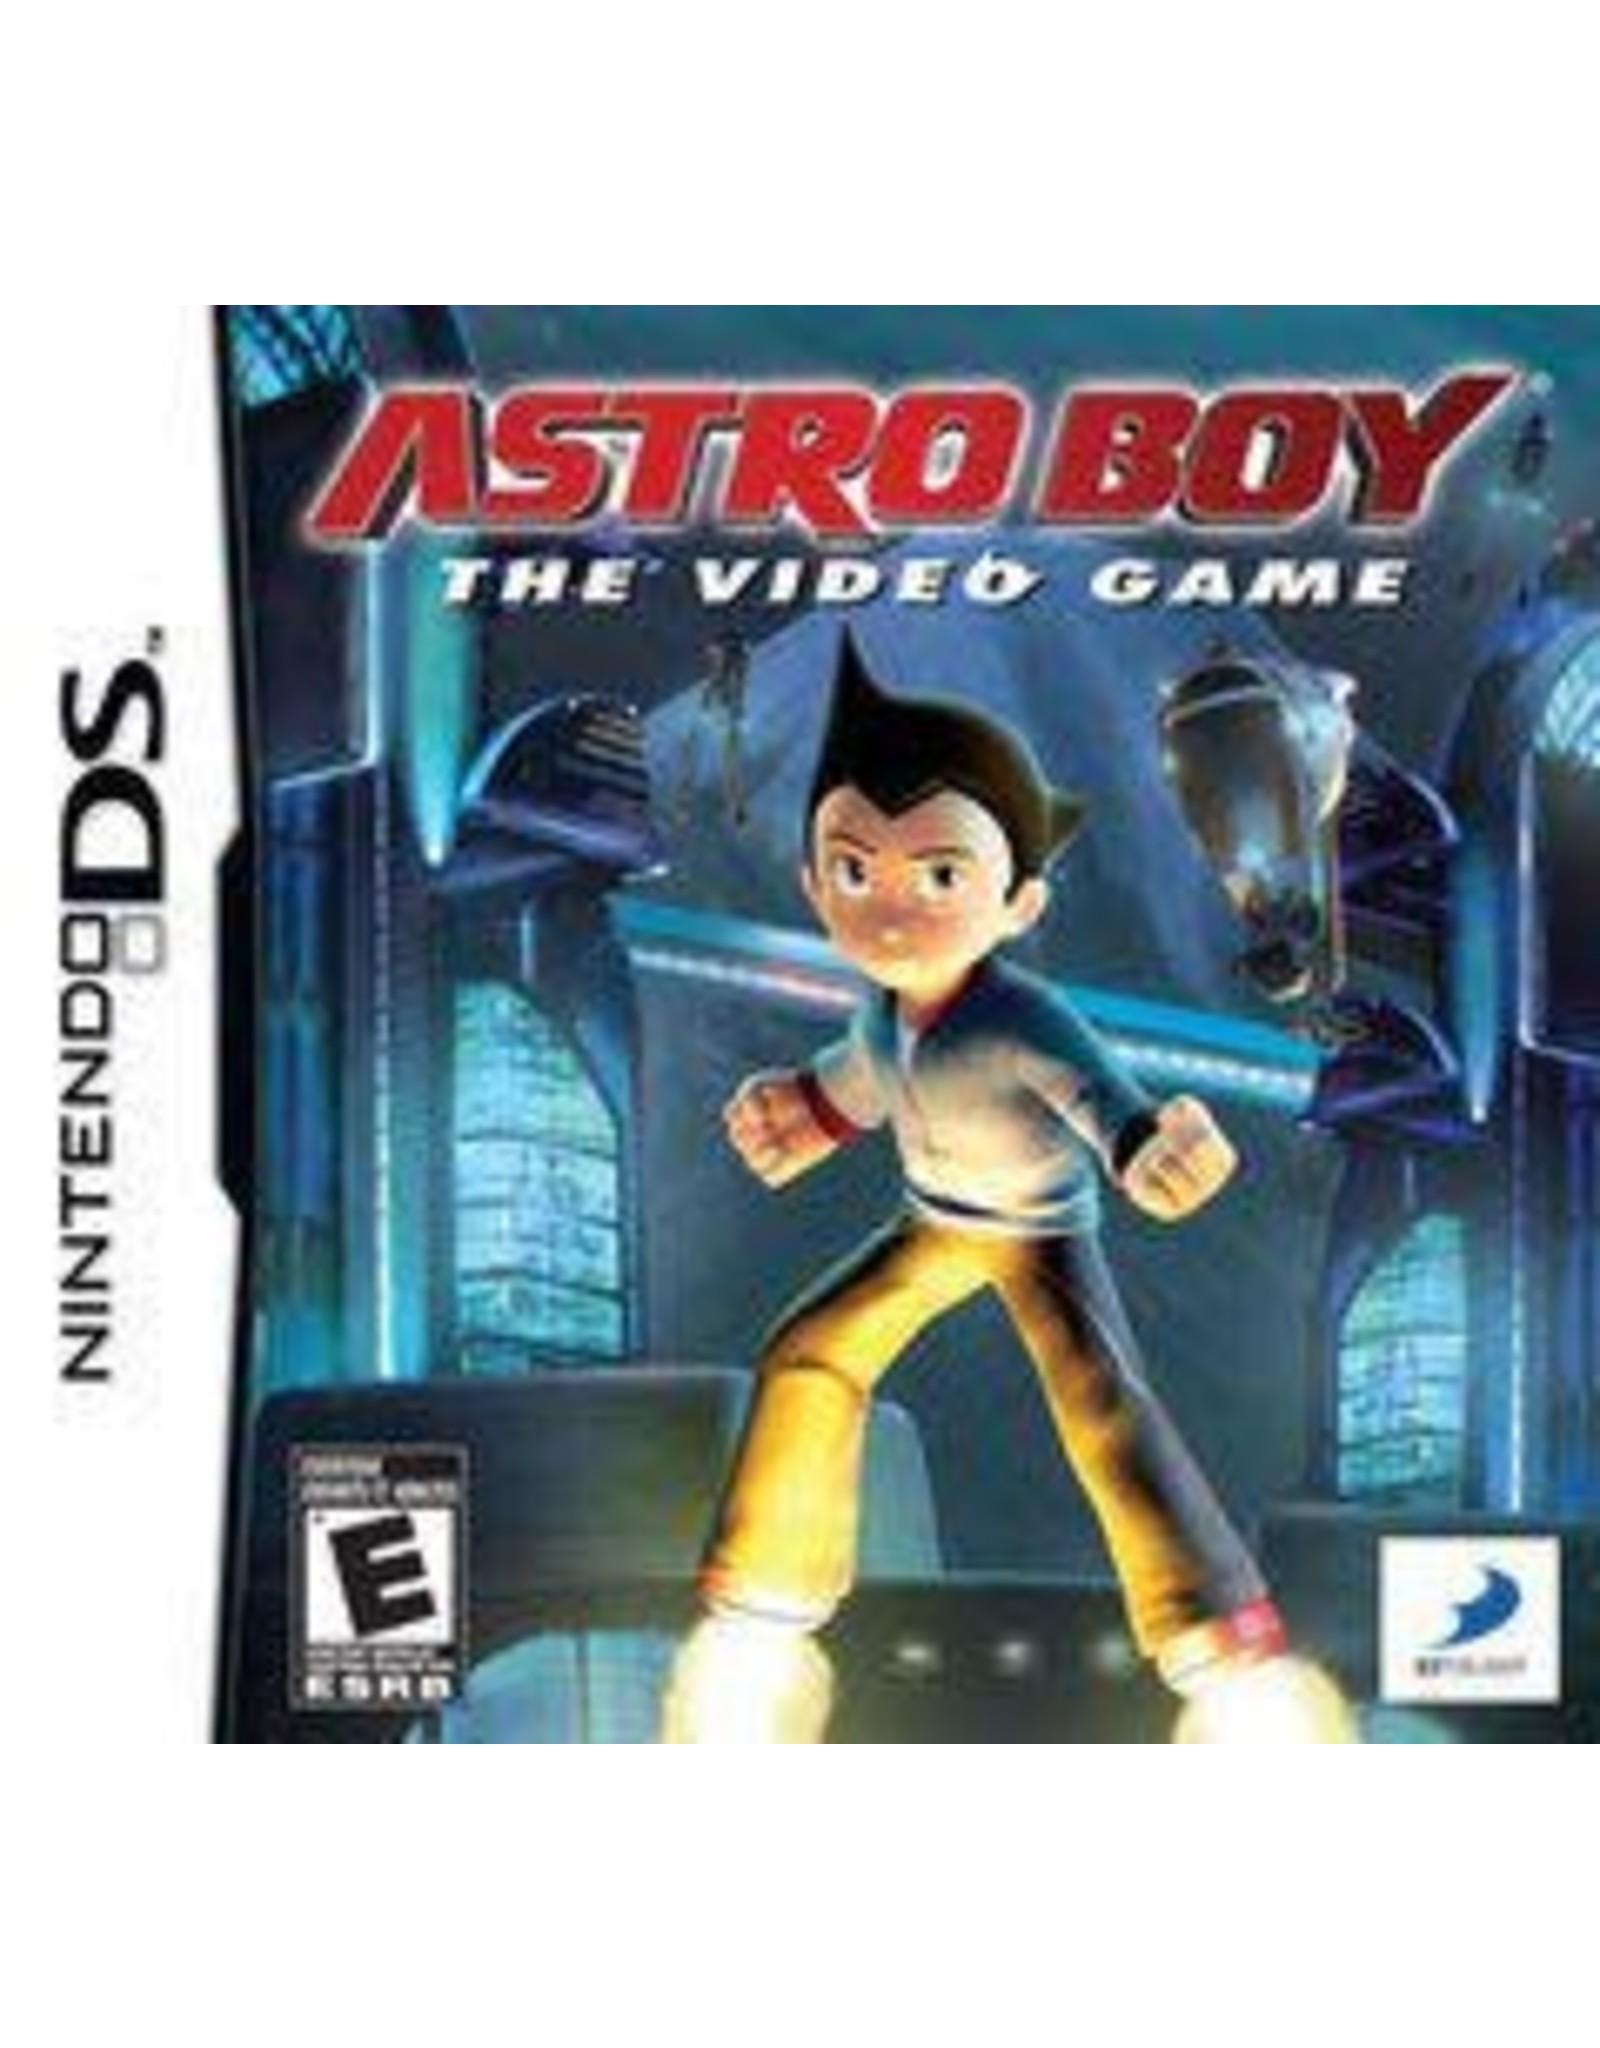 Nintendo DS Astro Boy: The Video Game (CiB)